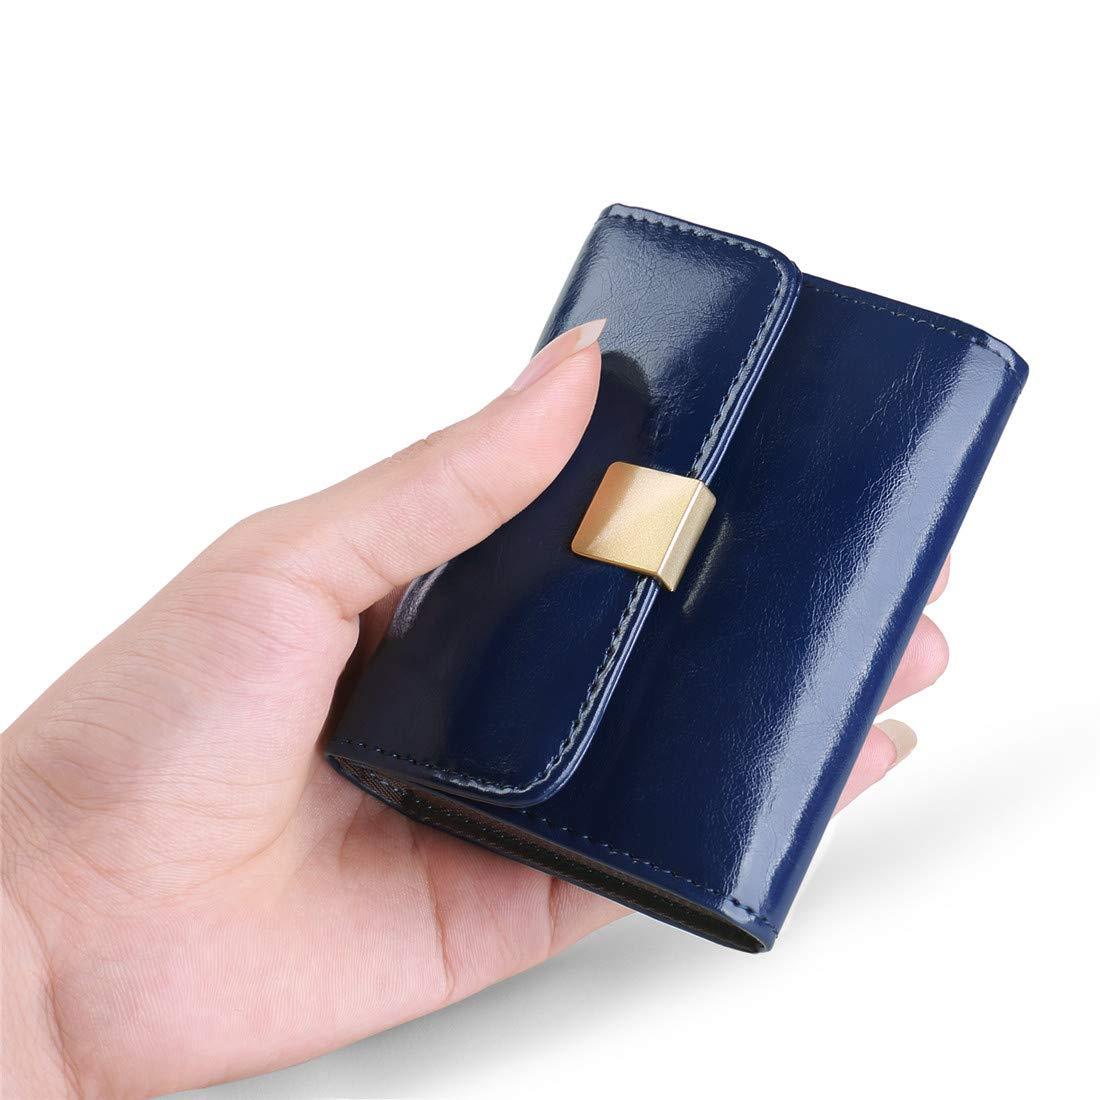 Huztencor Women's RFID Blocking Small Credit Card Holder Multi Card Case Wallet Mini Purse Compact Accordion Wallet for Women Ladies Slim Cute Little Front Pocket Wallets Organizer Oil Wax Blue